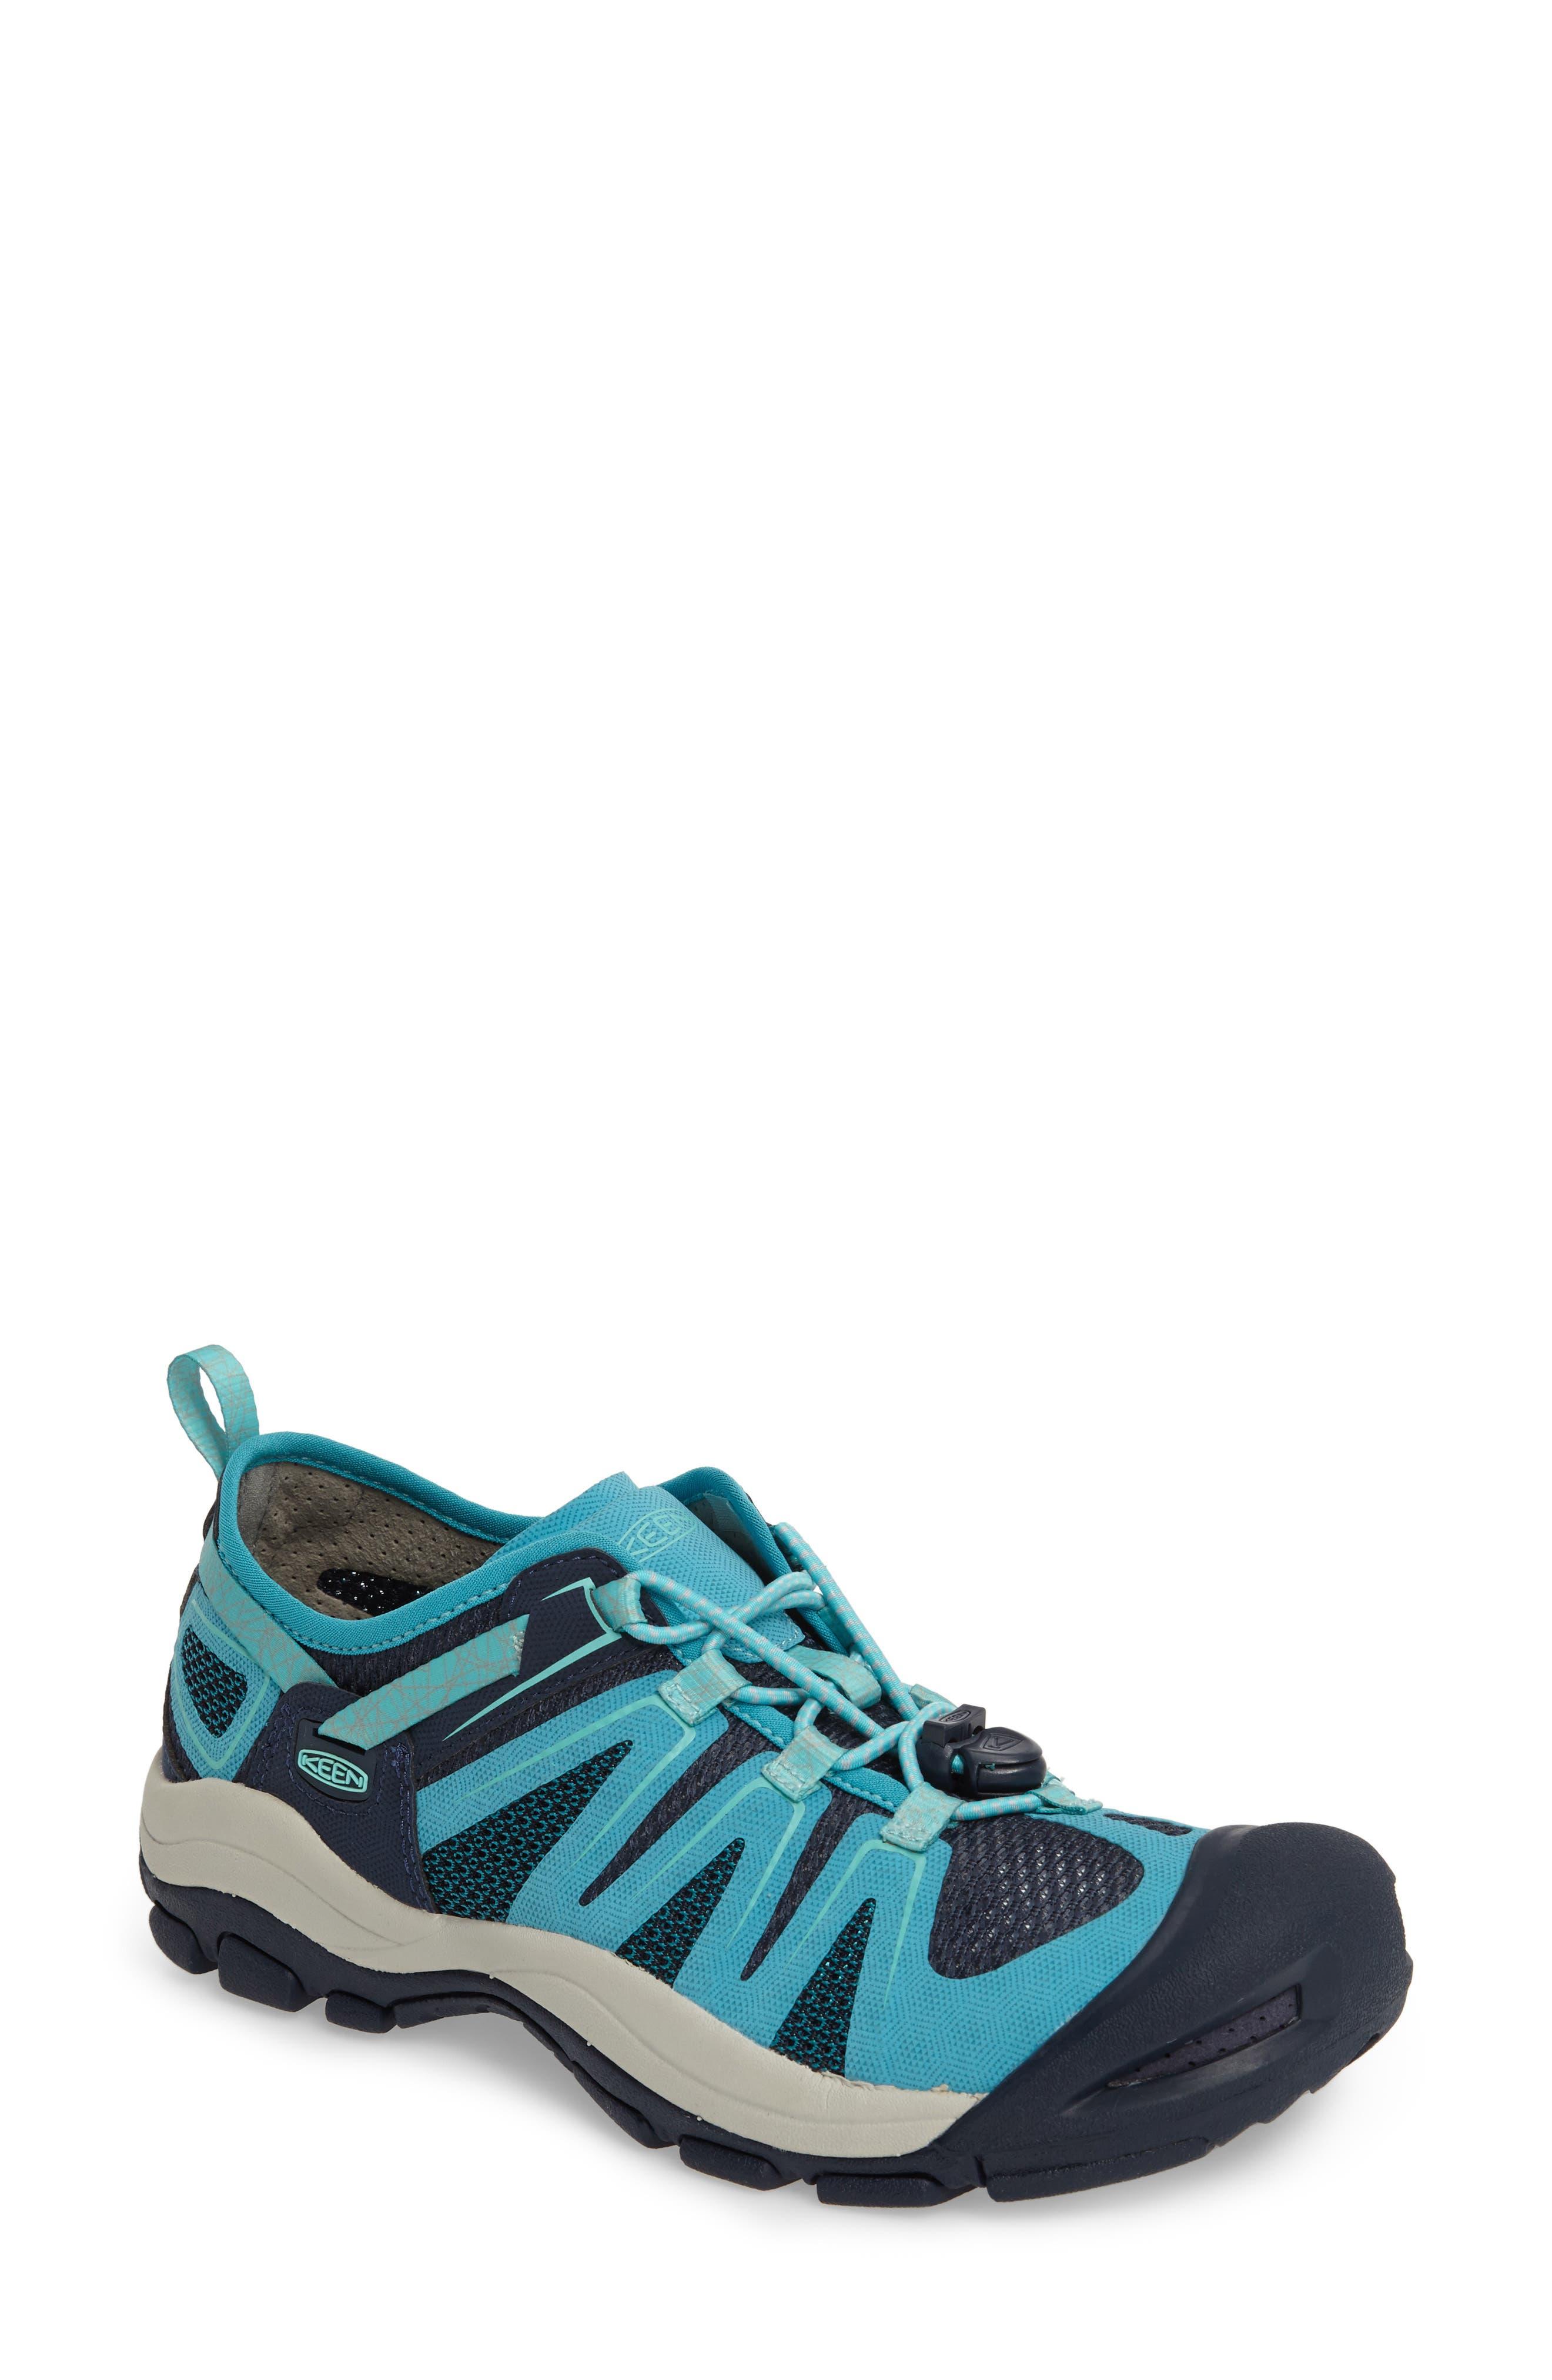 McKenzie II Waterproof Sneaker,                         Main,                         color,